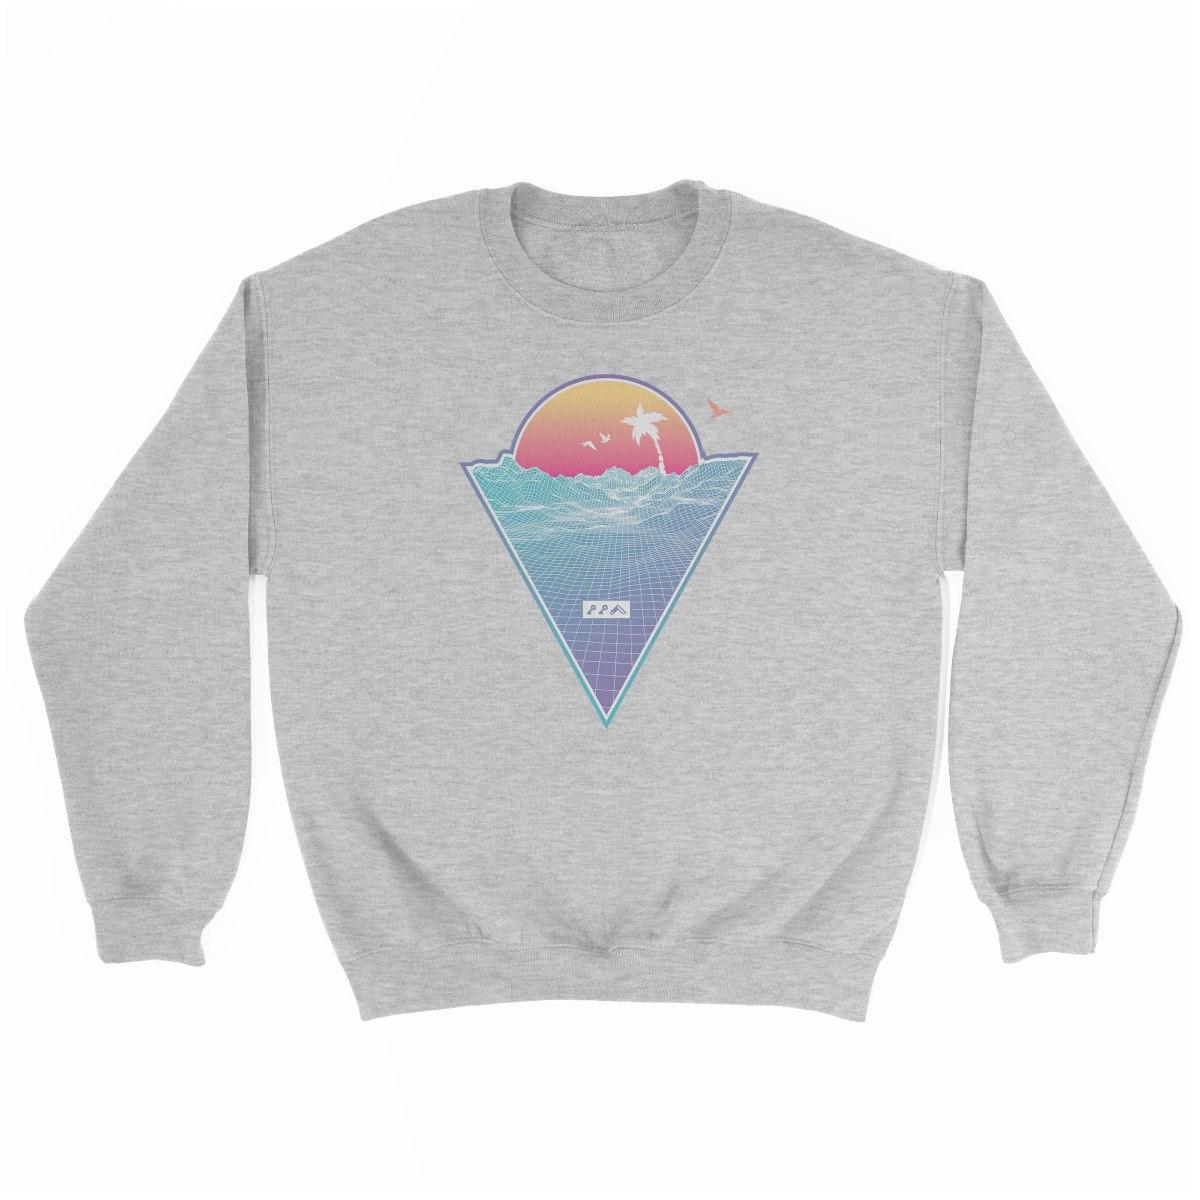 """OFF THE GRID"" cali vibes retro 80s design sweatshirt grey at kikicutt.com"